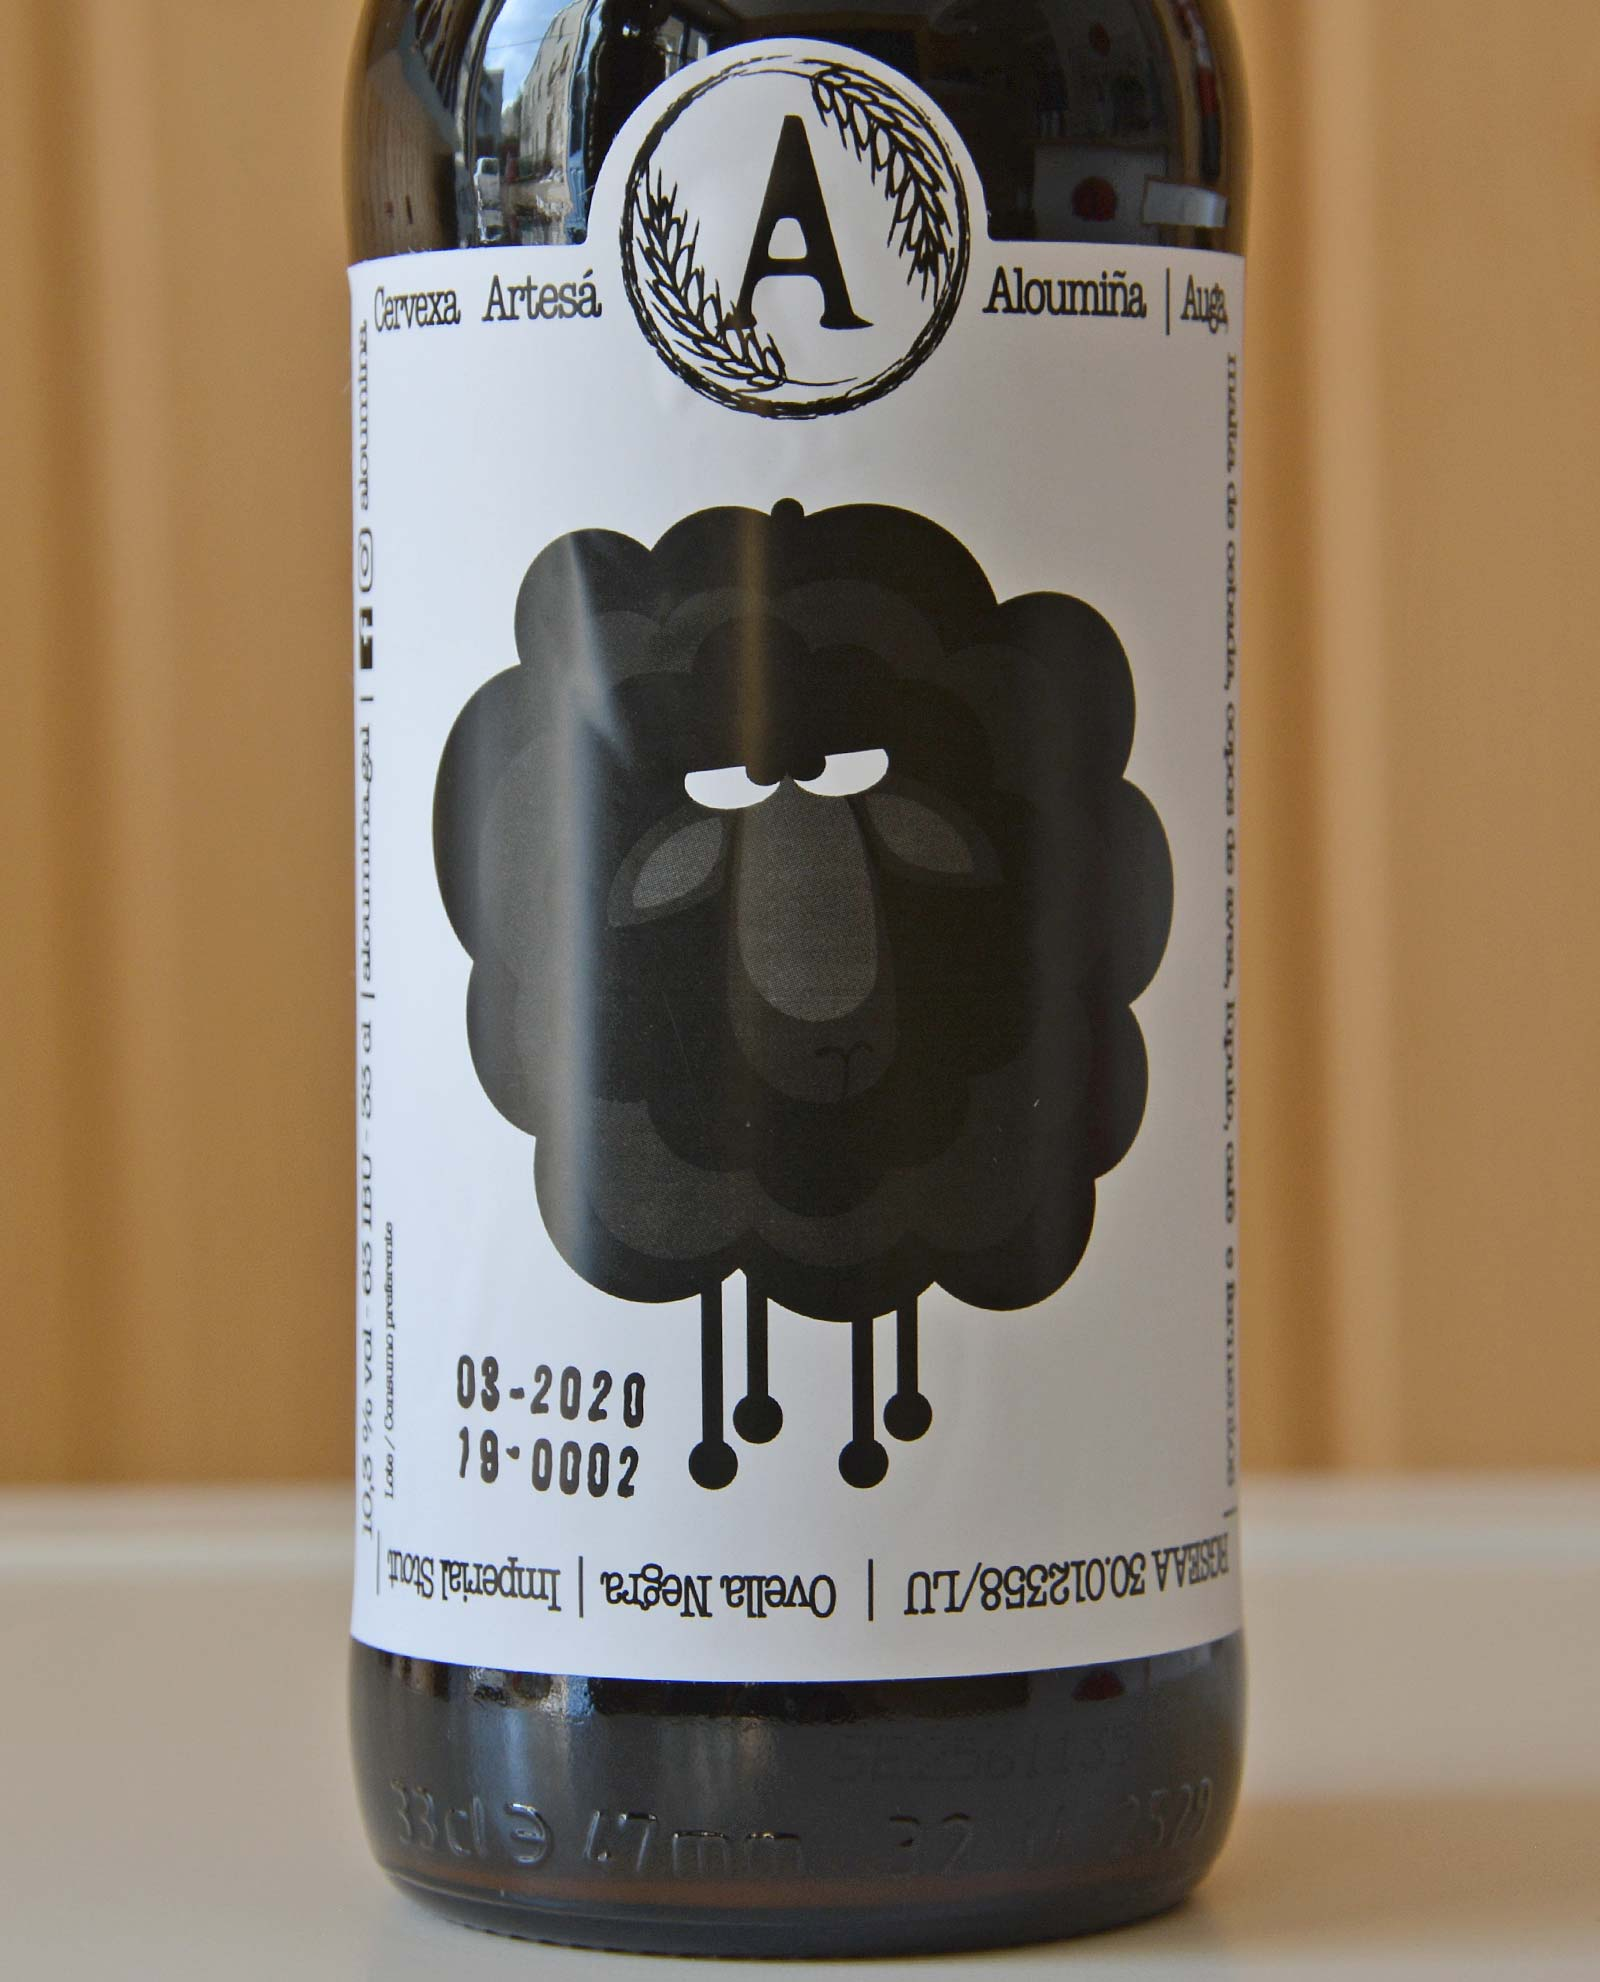 aloumina-cerveza-artesana-craft-beer-lugo-galicia-ovellanegra-russianimperial-001